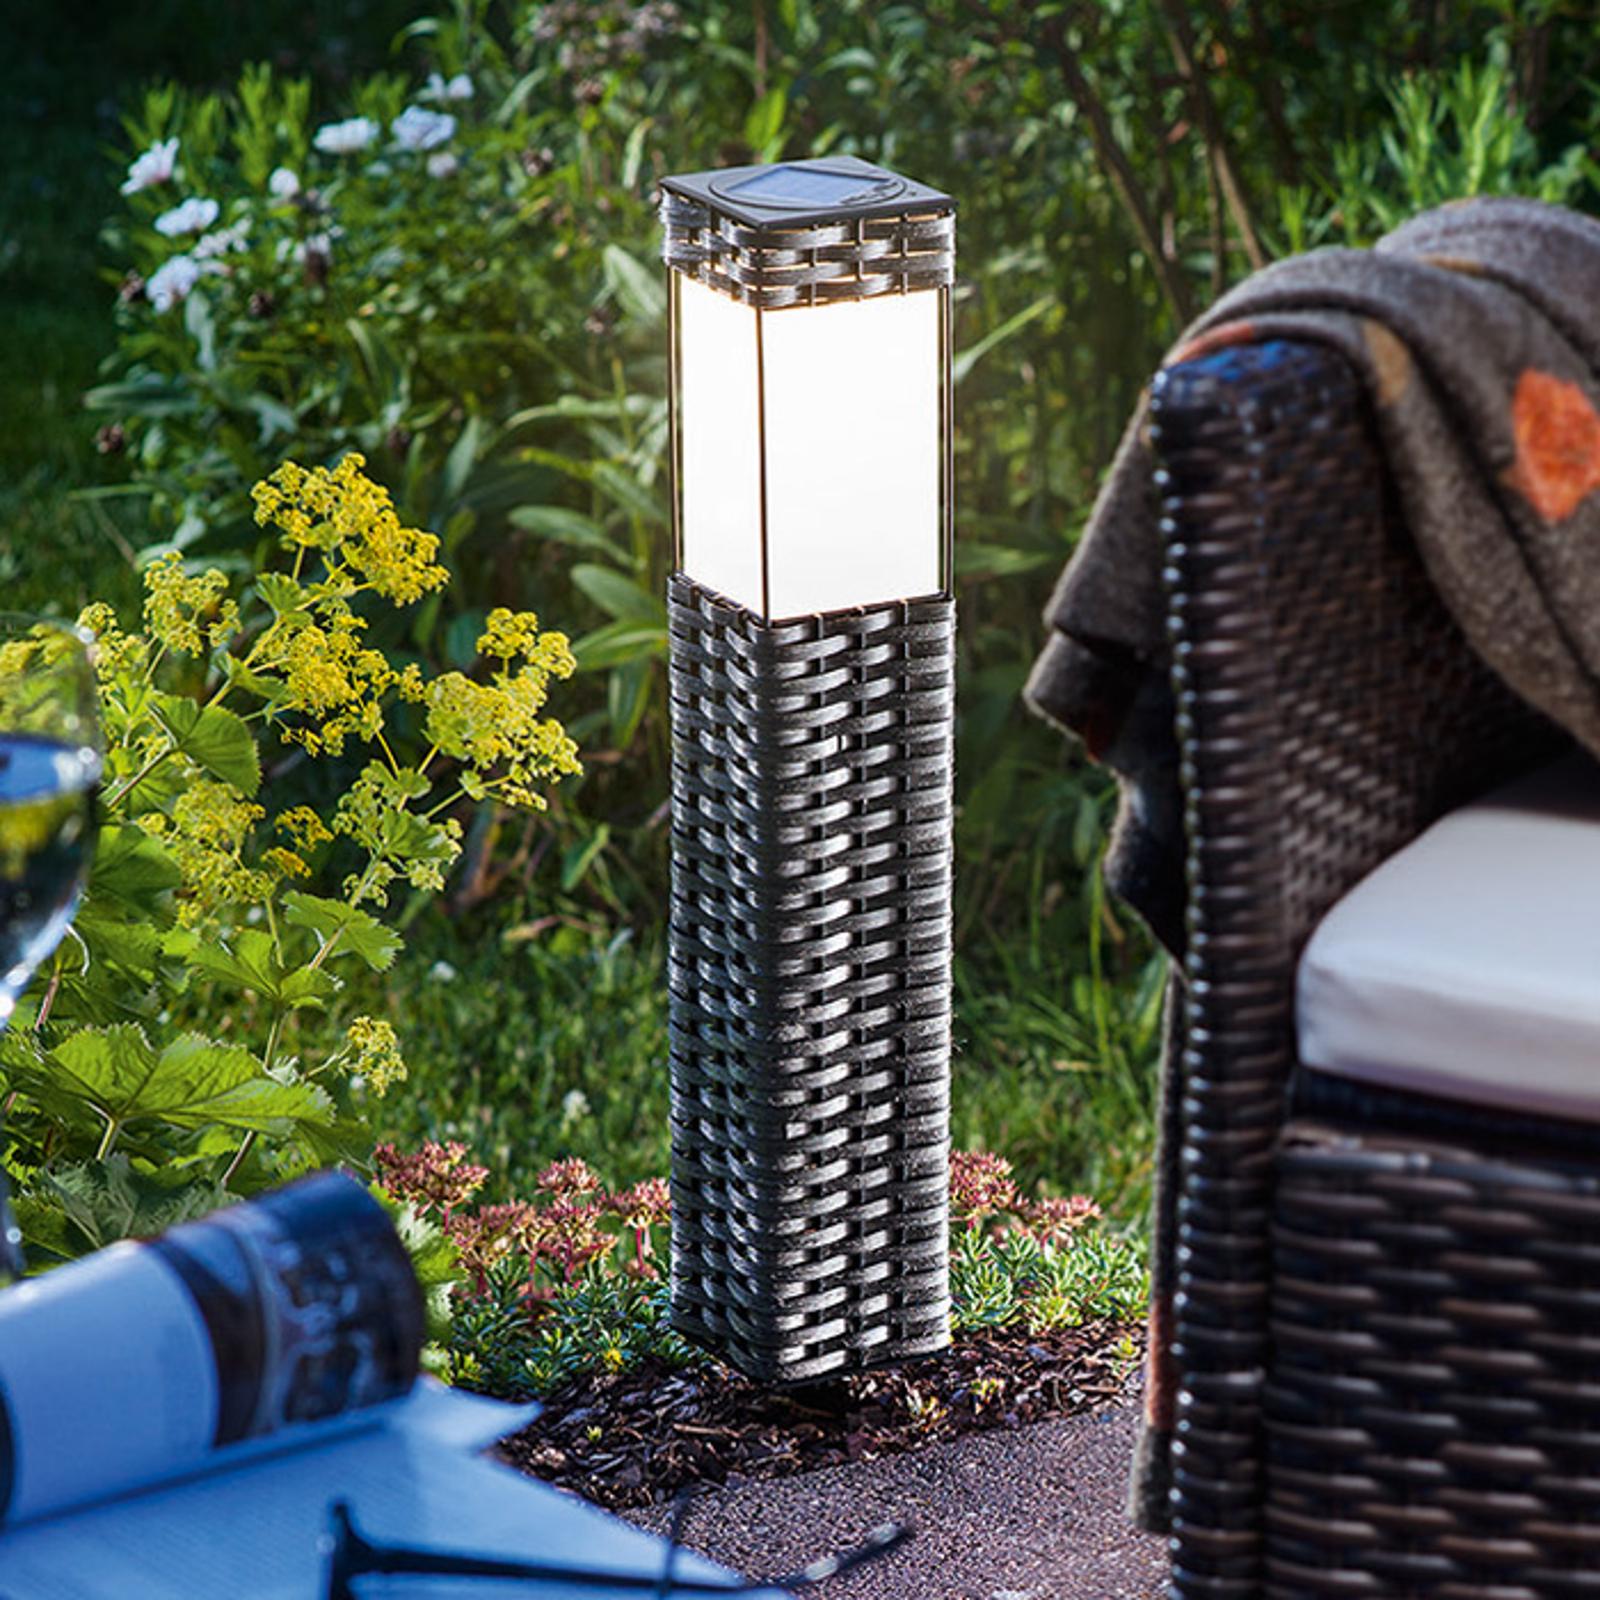 Solárna LED lampa Rattan – univerzálna biela_3012513_1